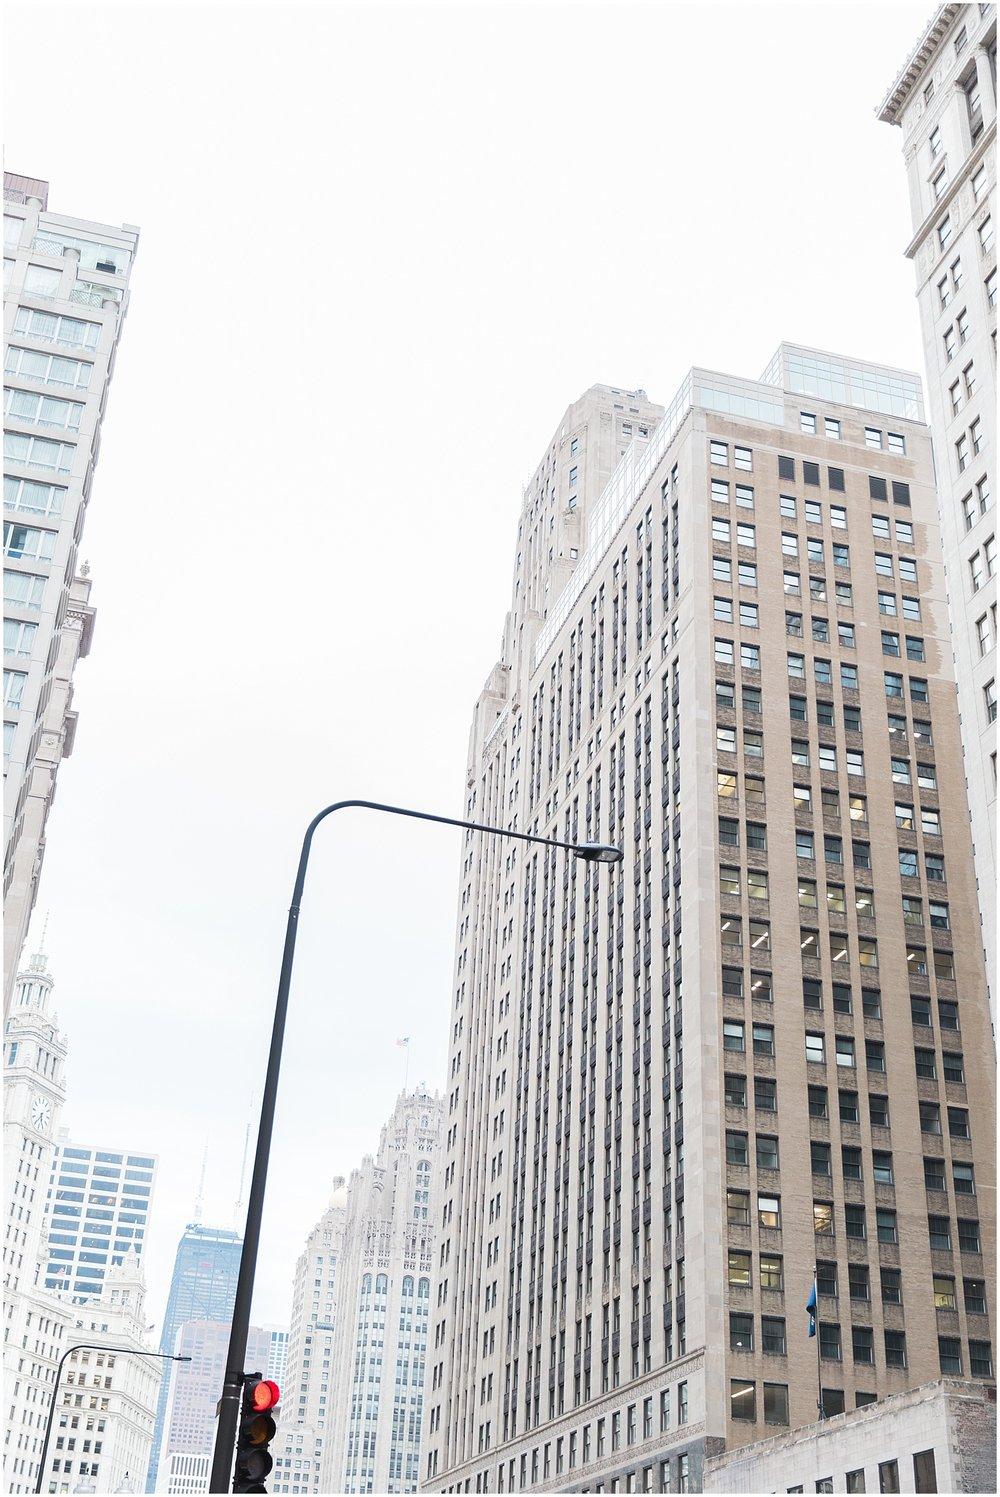 CHICAGO PHOTOGRAPHY | MARISSA CRIBBS PHOTOGRAPHY_1799.jpg